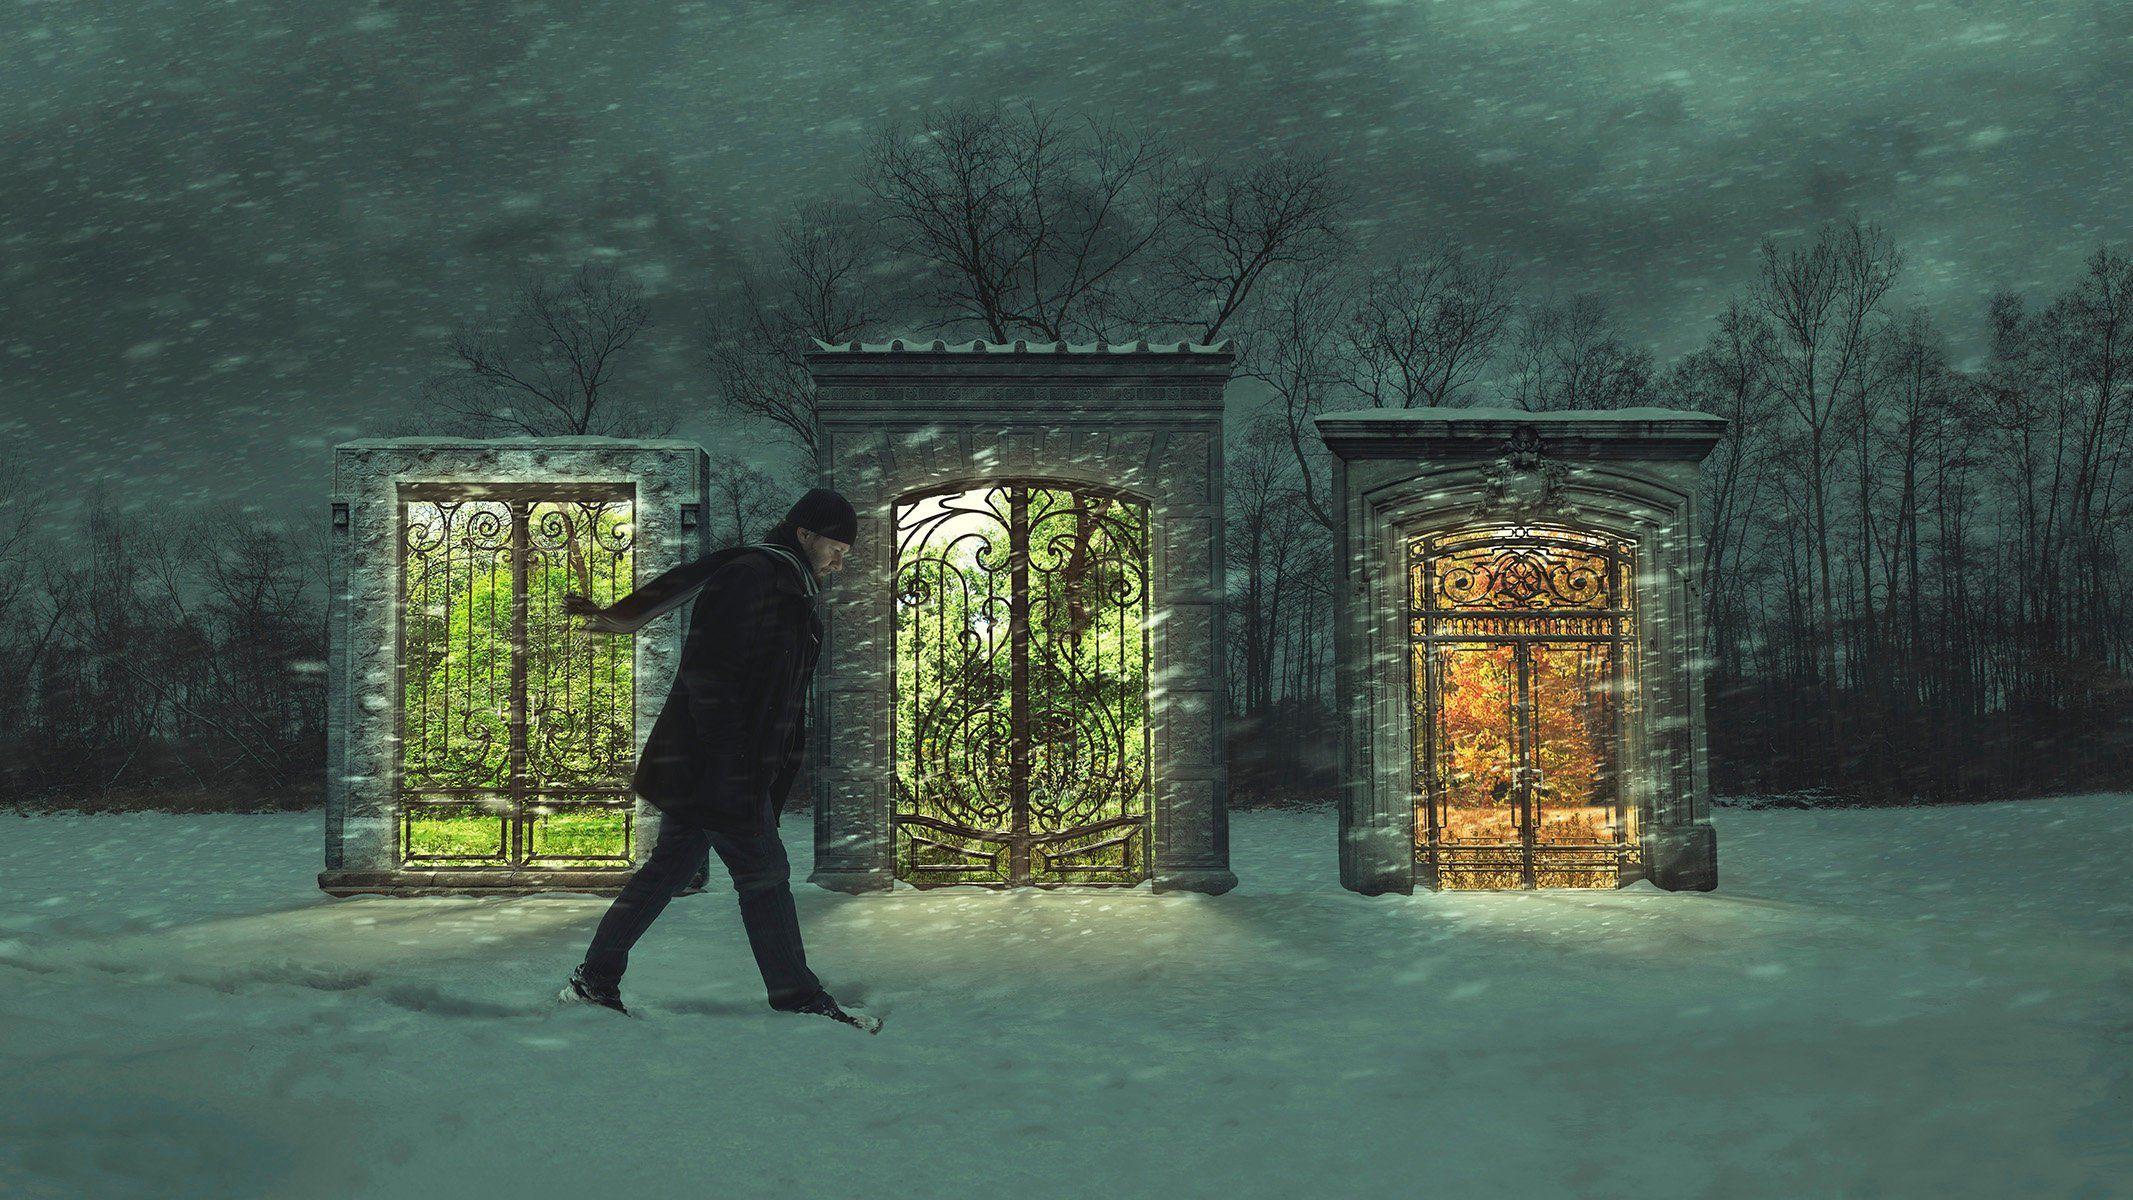 Fine art photography print fantasy winter scene in etsy